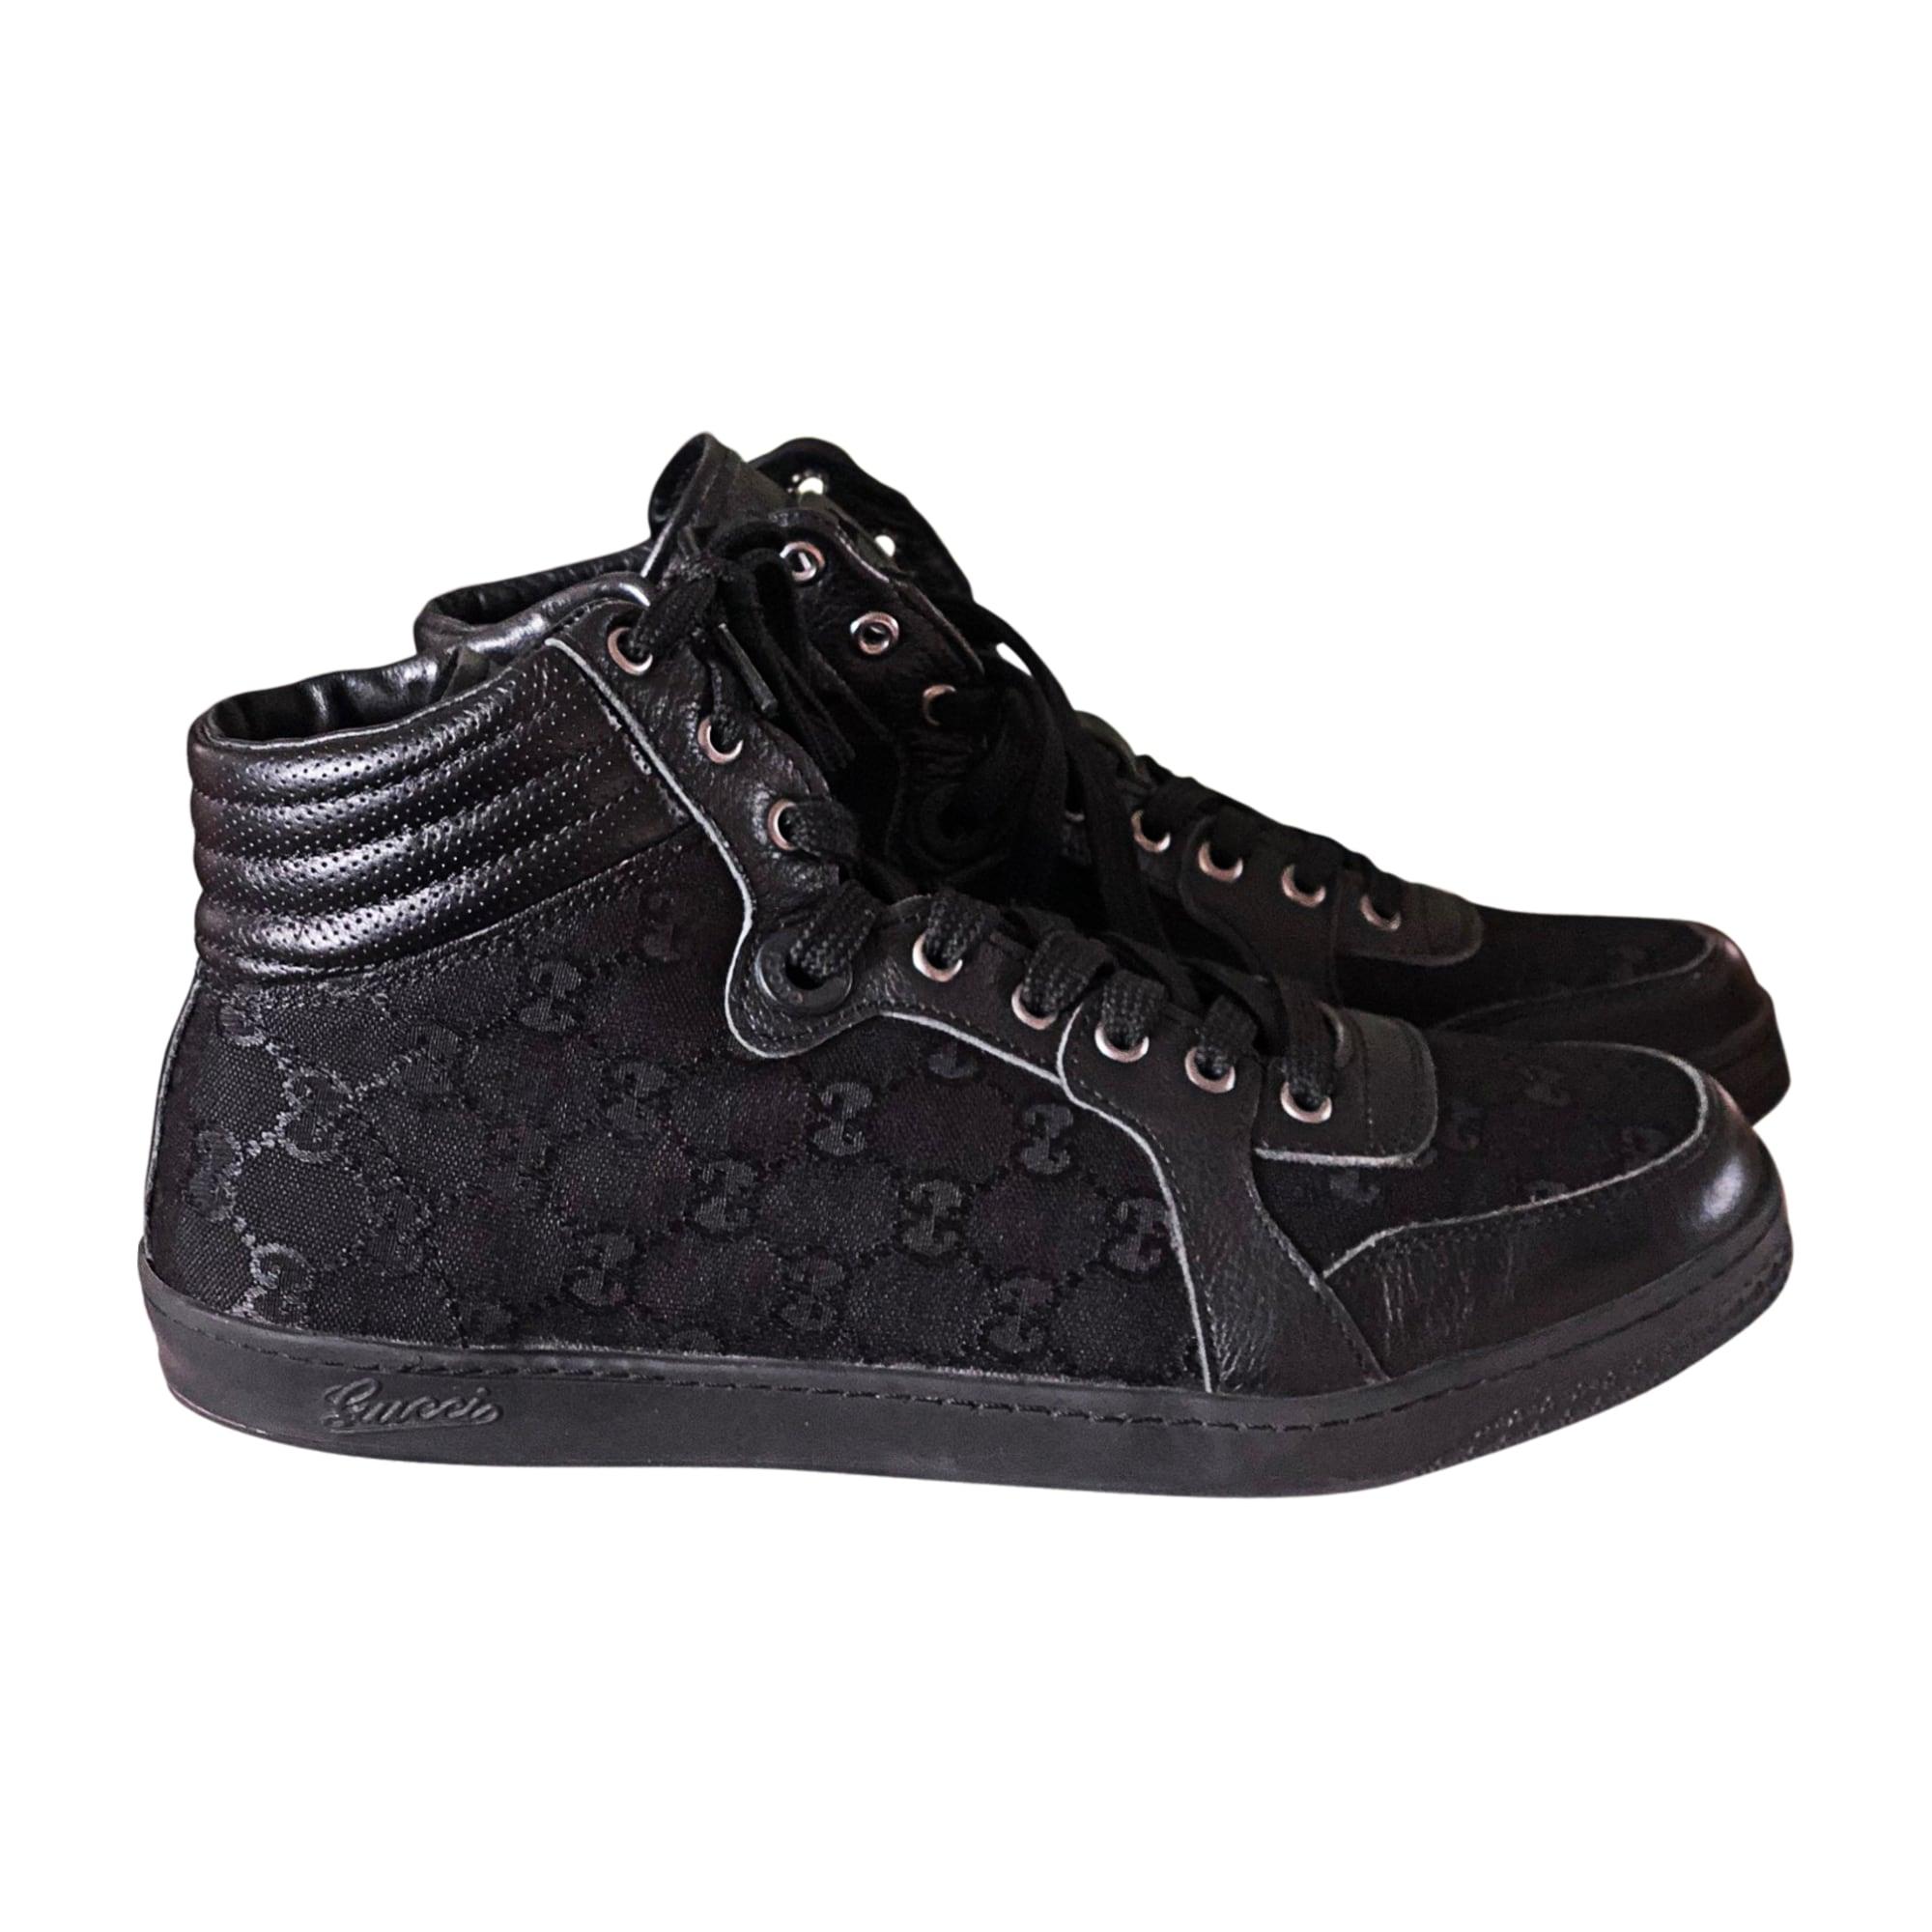 Baskets GUCCI 44 noir - 7780837 e267f3db505